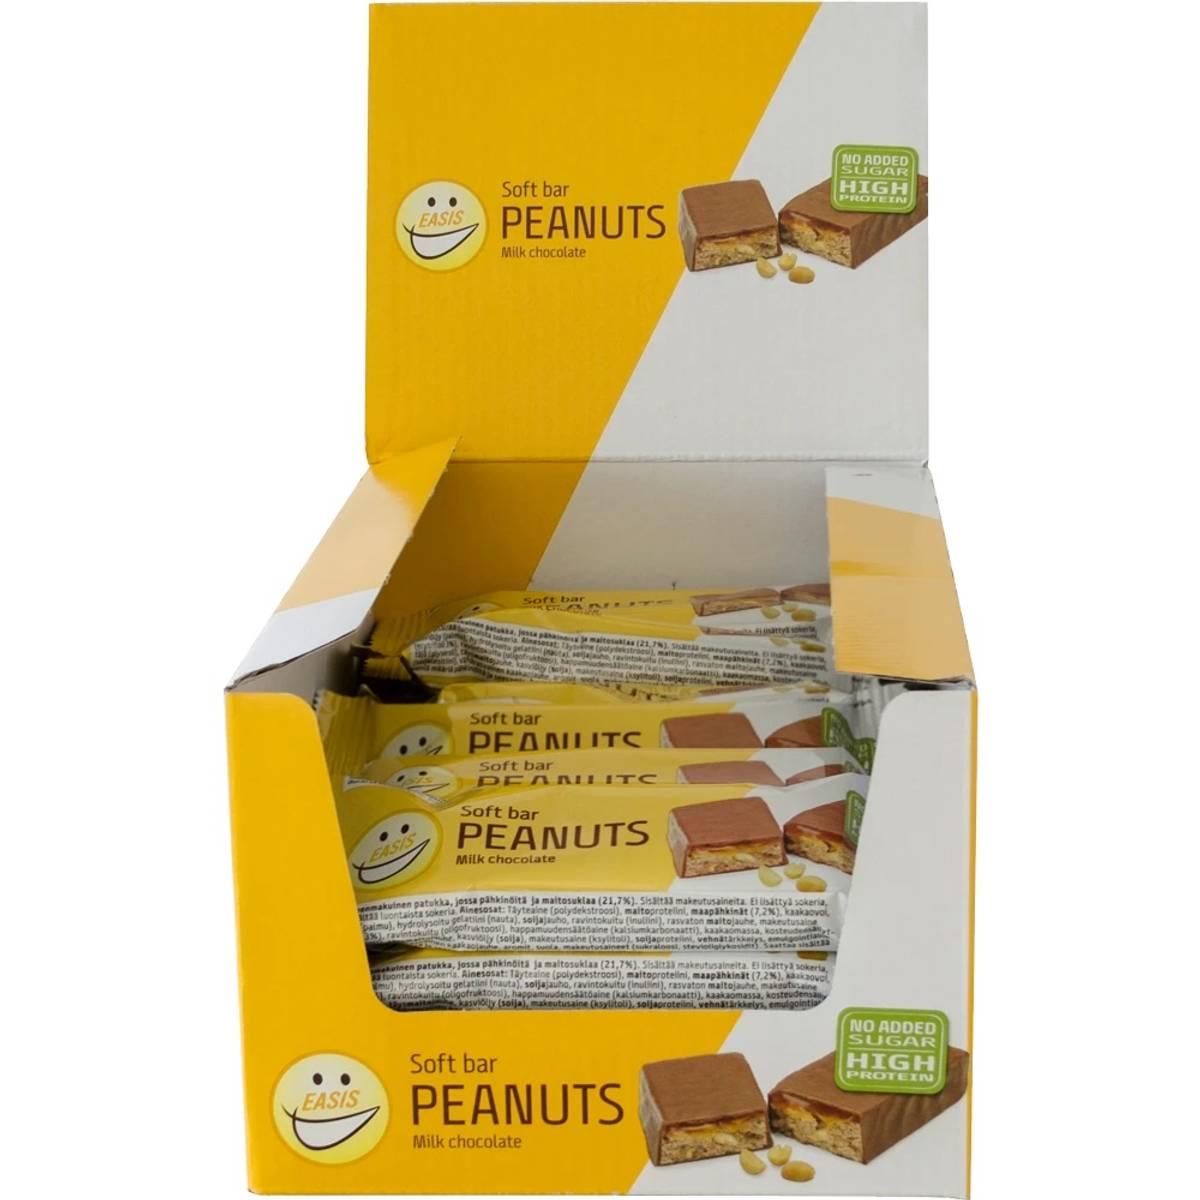 EASIS Soft bar Peanuts med sjokolade, eske á 24 stk